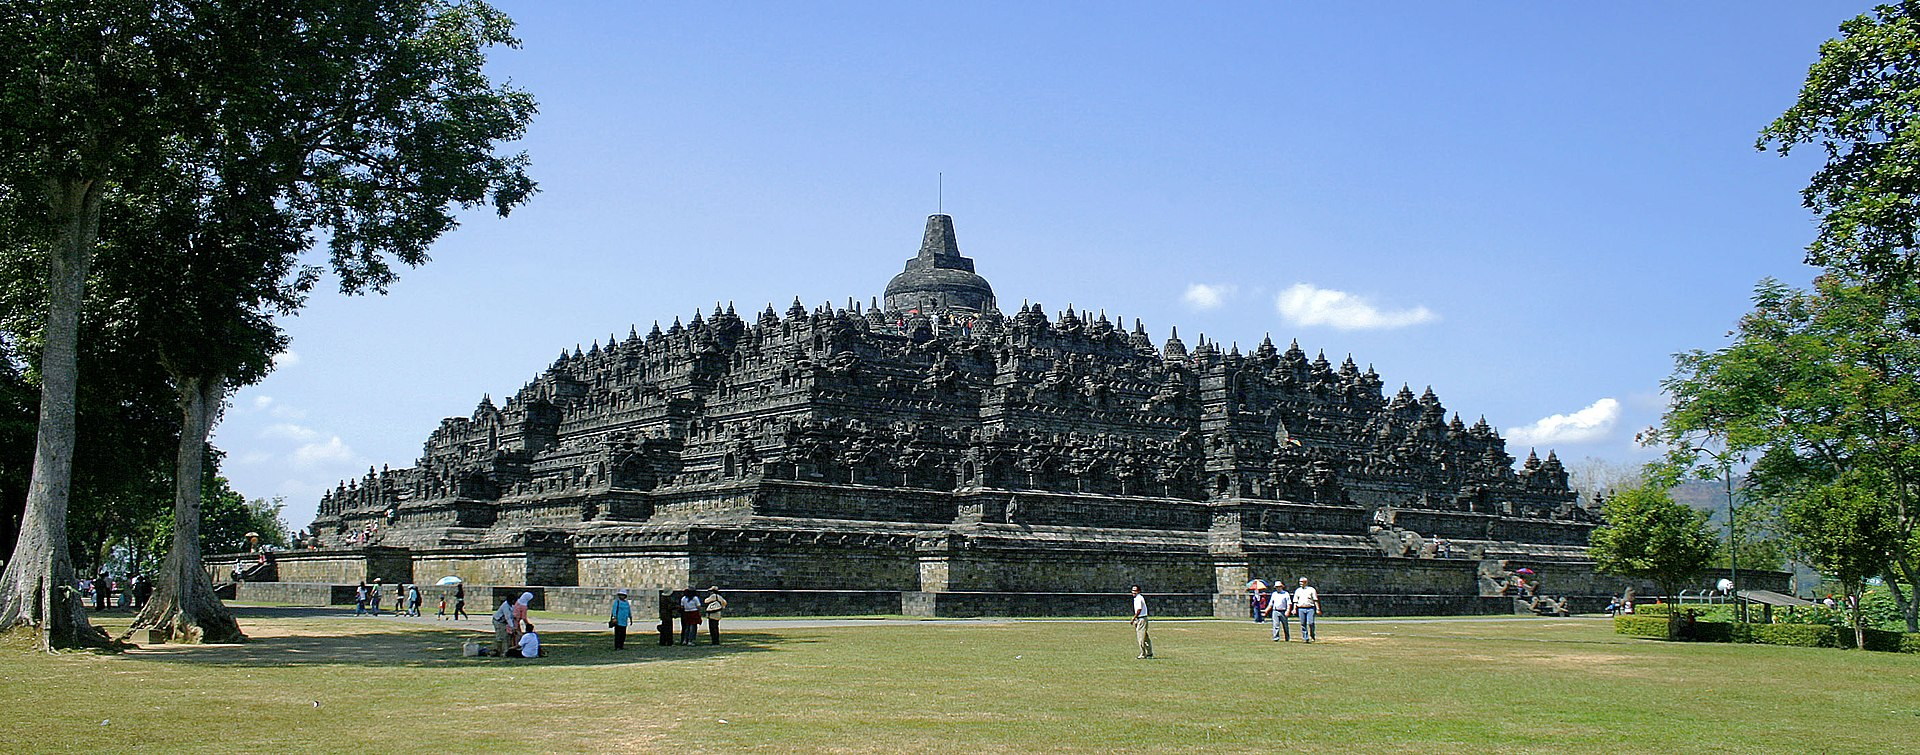 http://upload.wikimedia.org/wikipedia/commons/thumb/8/8c/Borobudur-Nothwest-view.jpg/1920px-Borobudur-Nothwest-view.jpg